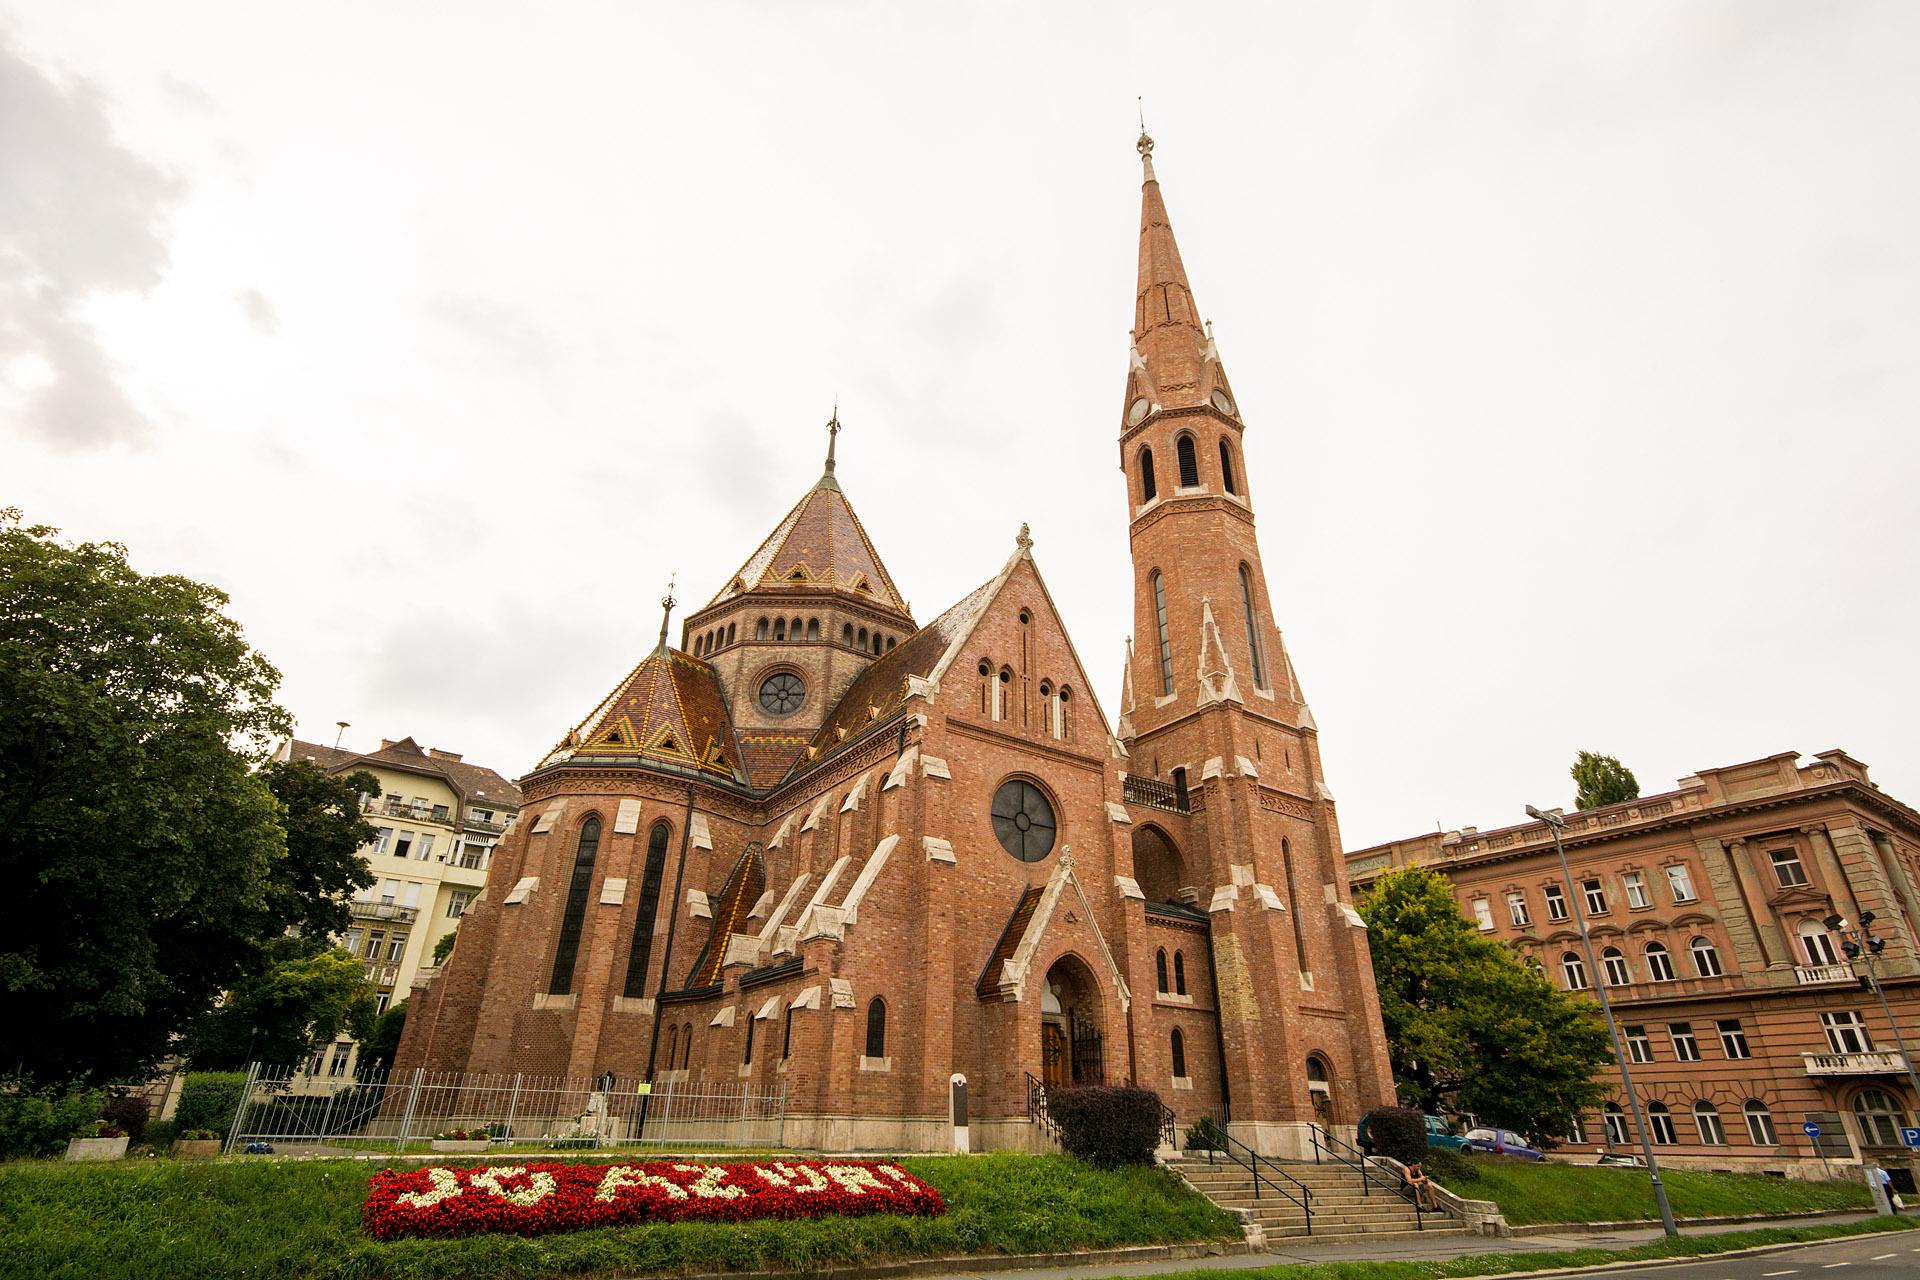 Szilagyi Dezso Square Presbyterian Church